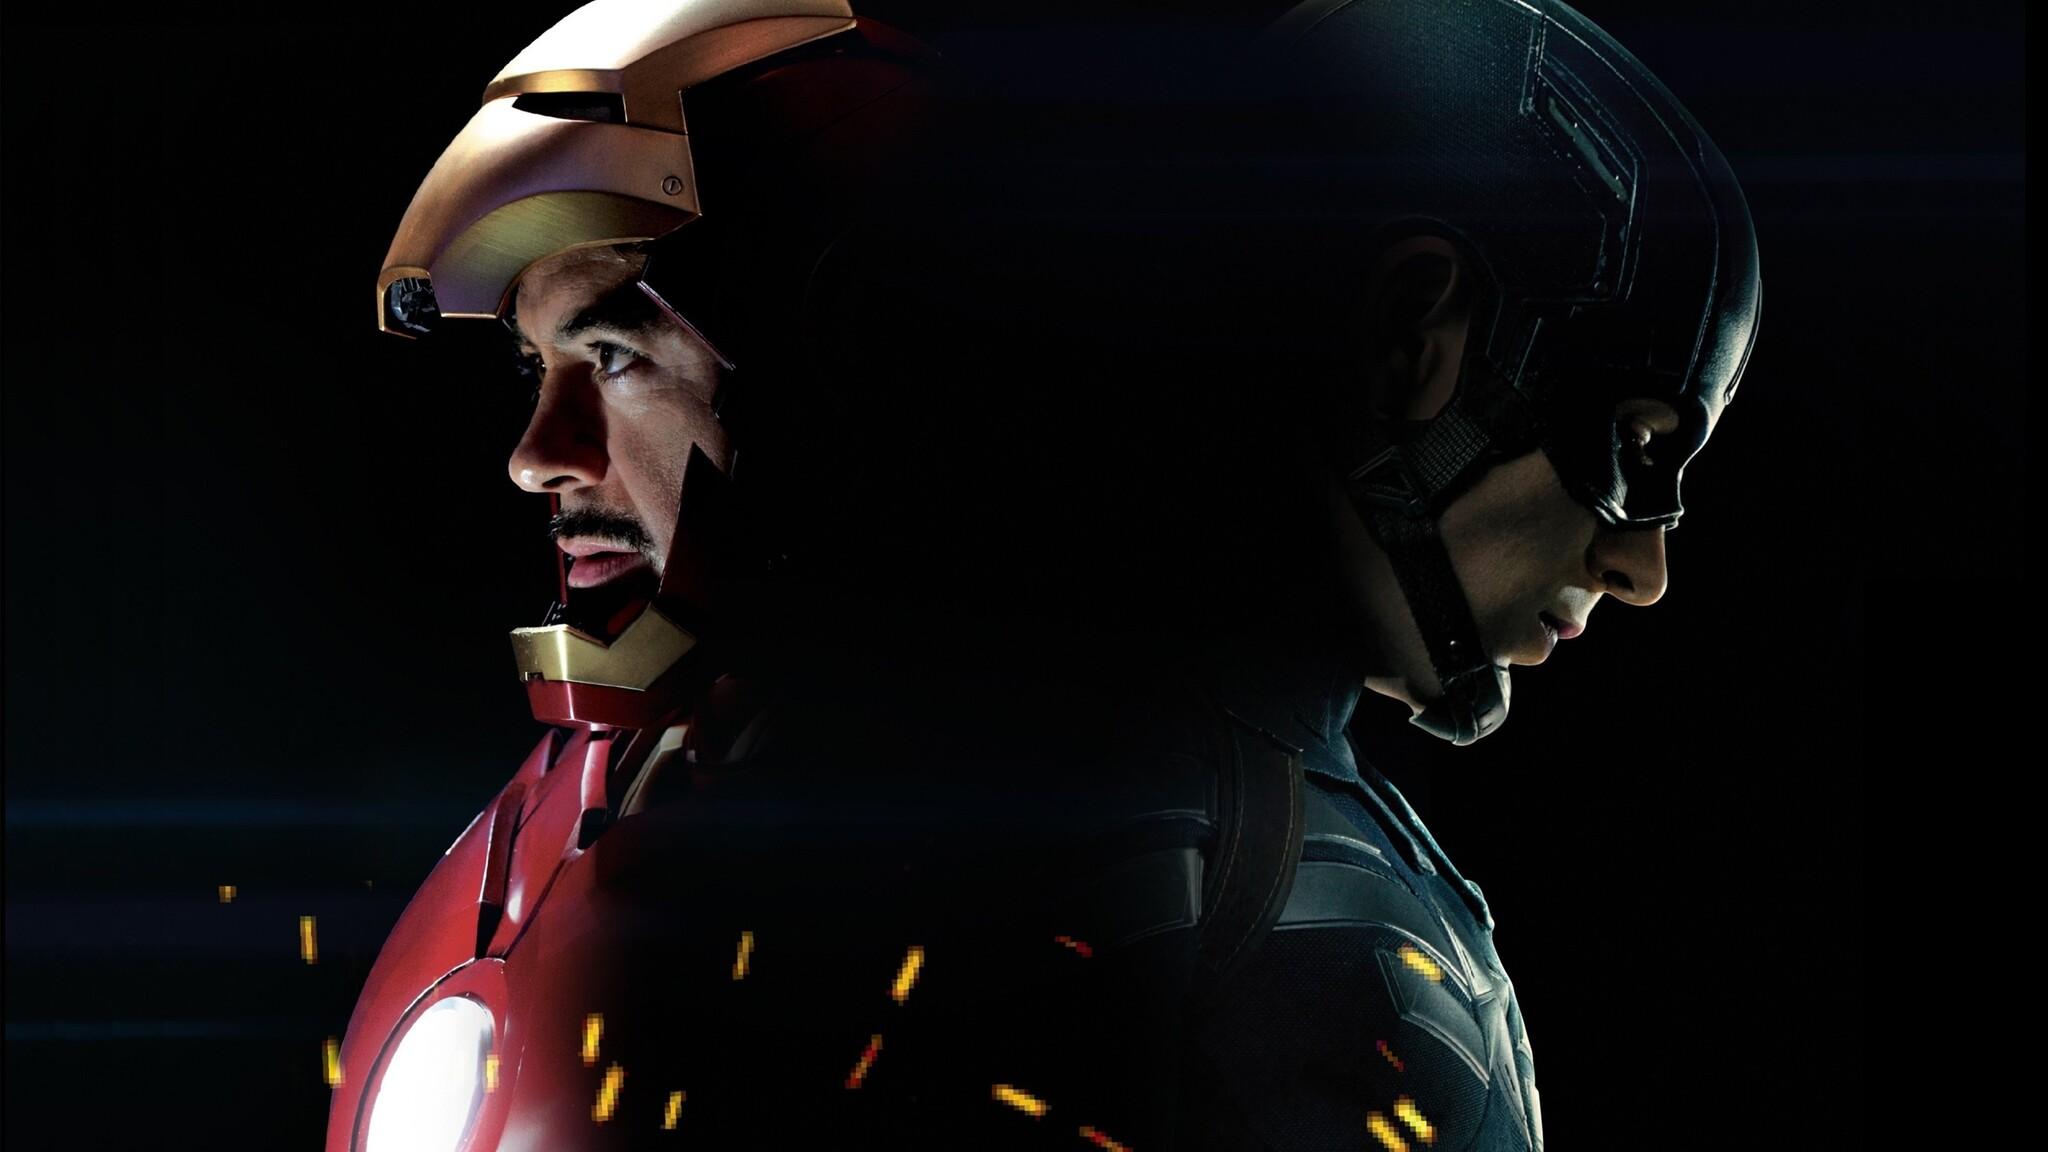 Captain America Civil War Wallpaper 4k: 2048x1152 Captain America 3 Civil War Iron Man 2048x1152